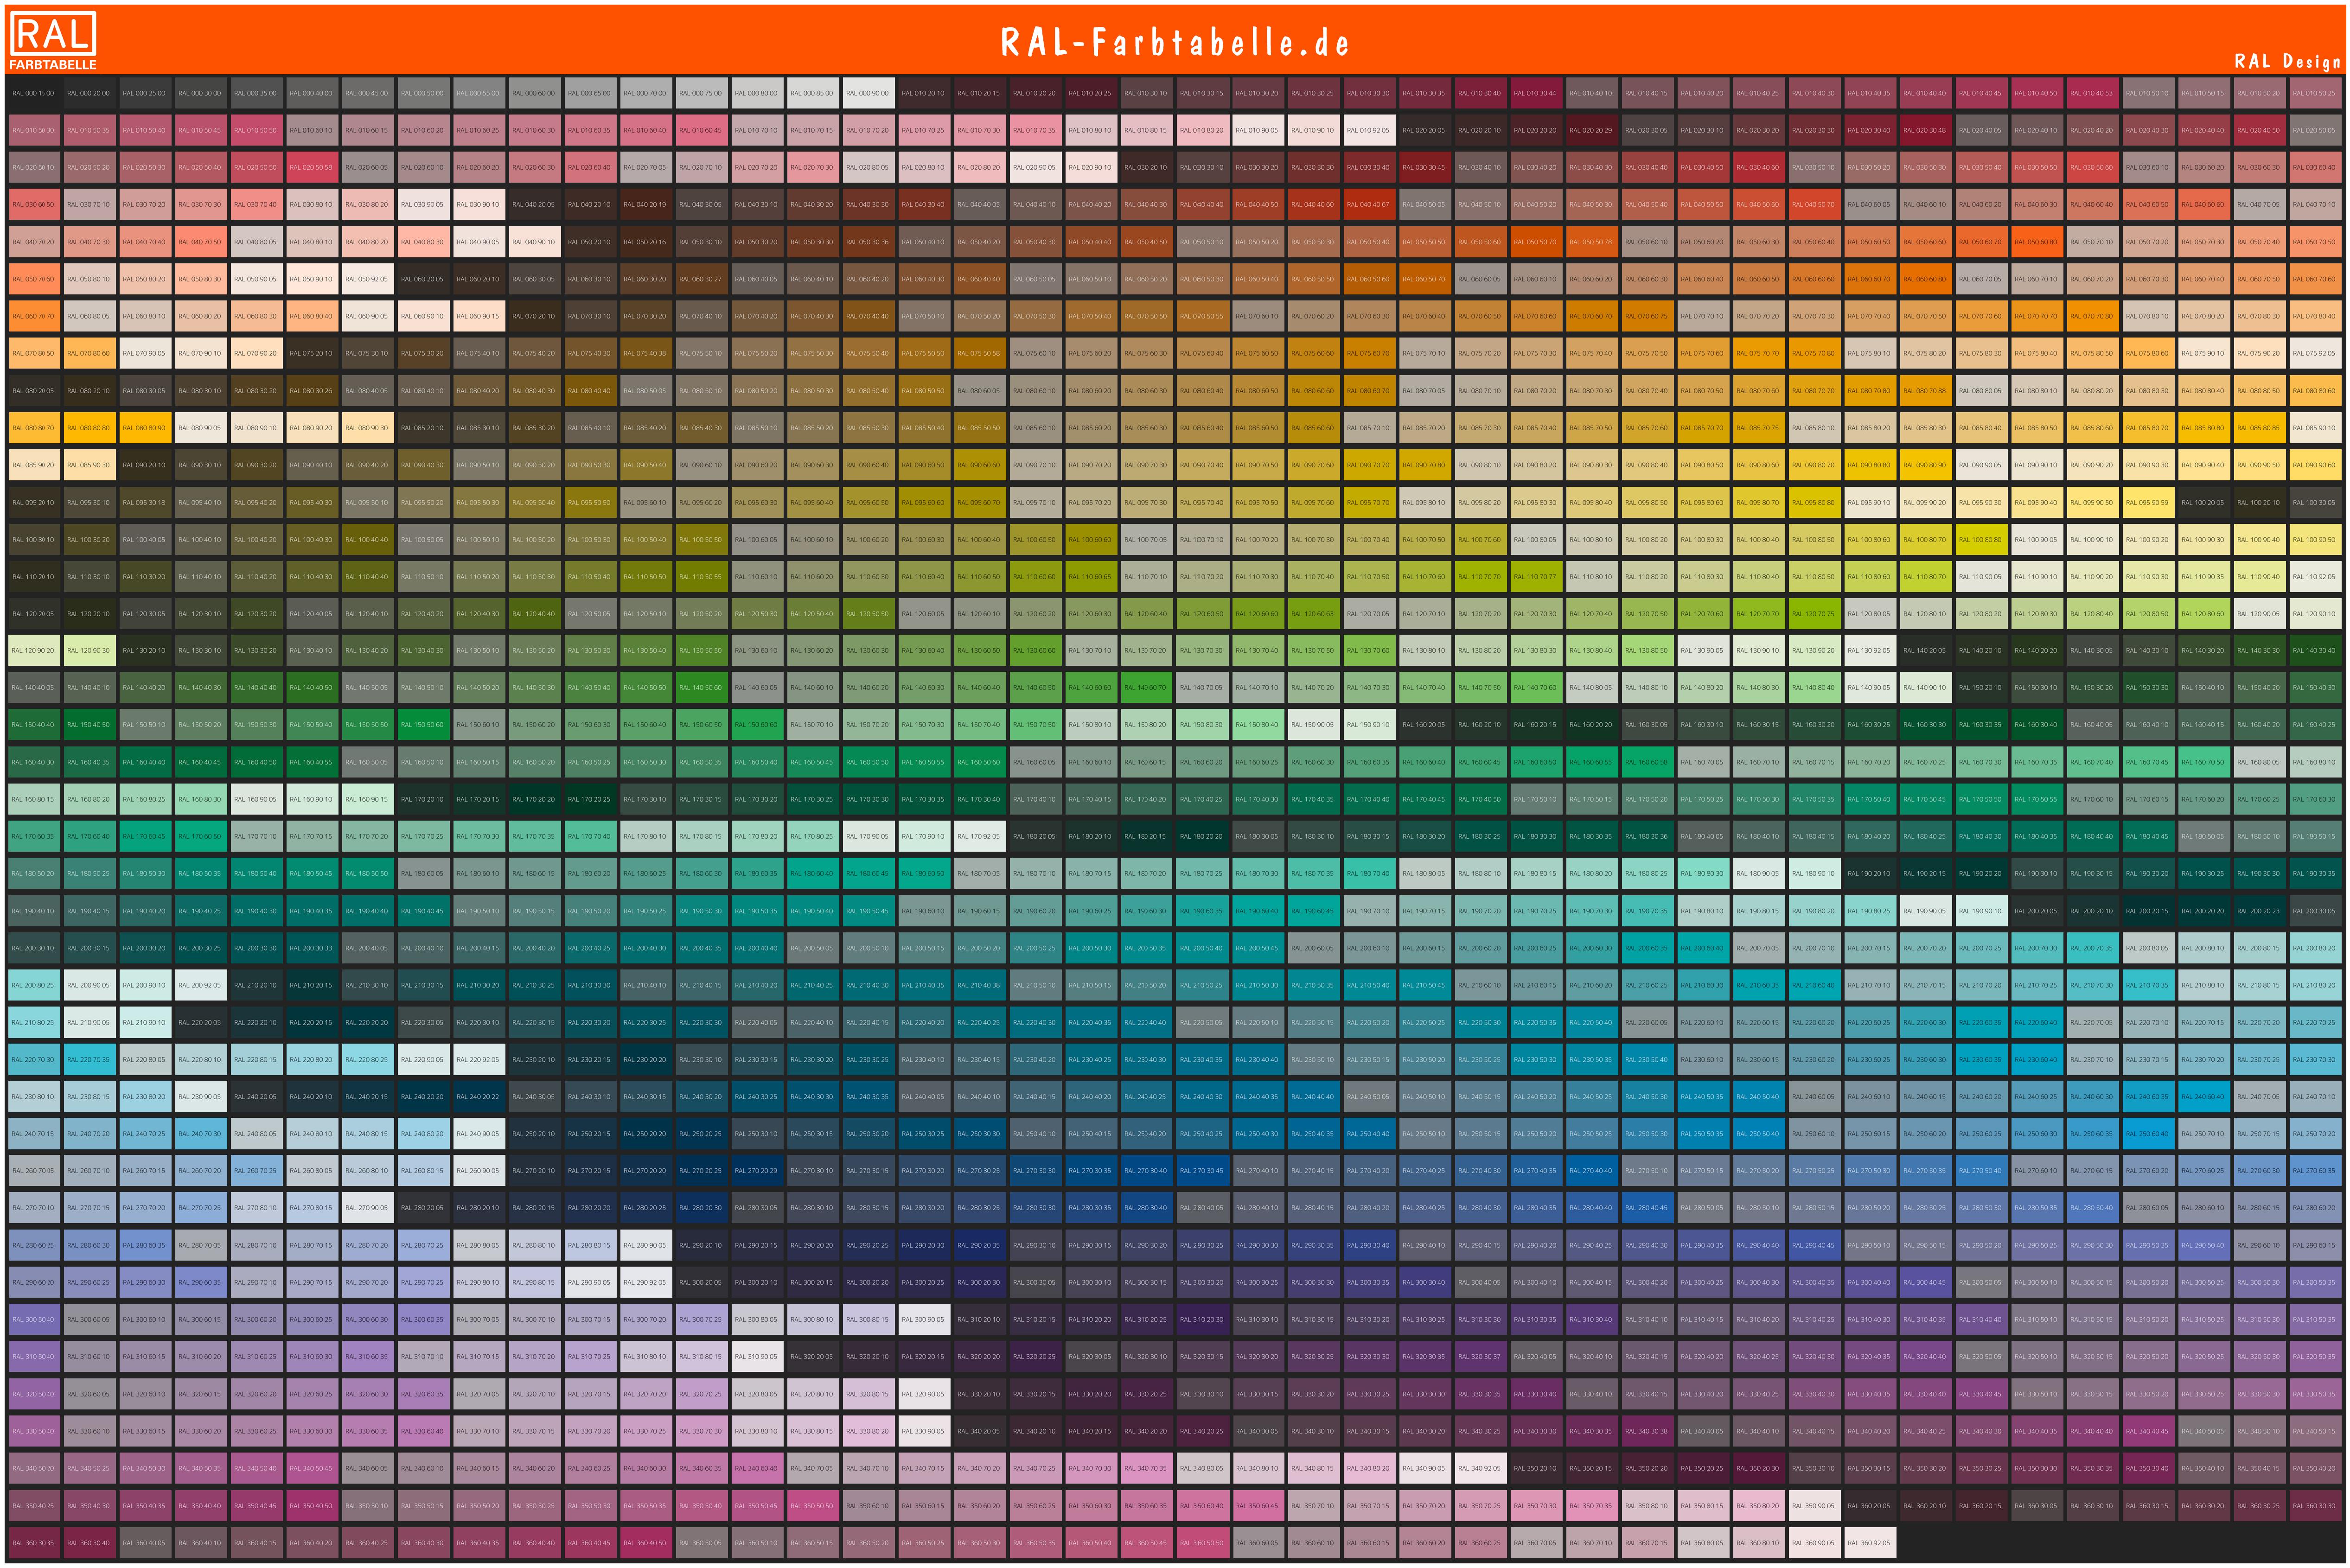 RAL Design D2 farbfächer farben